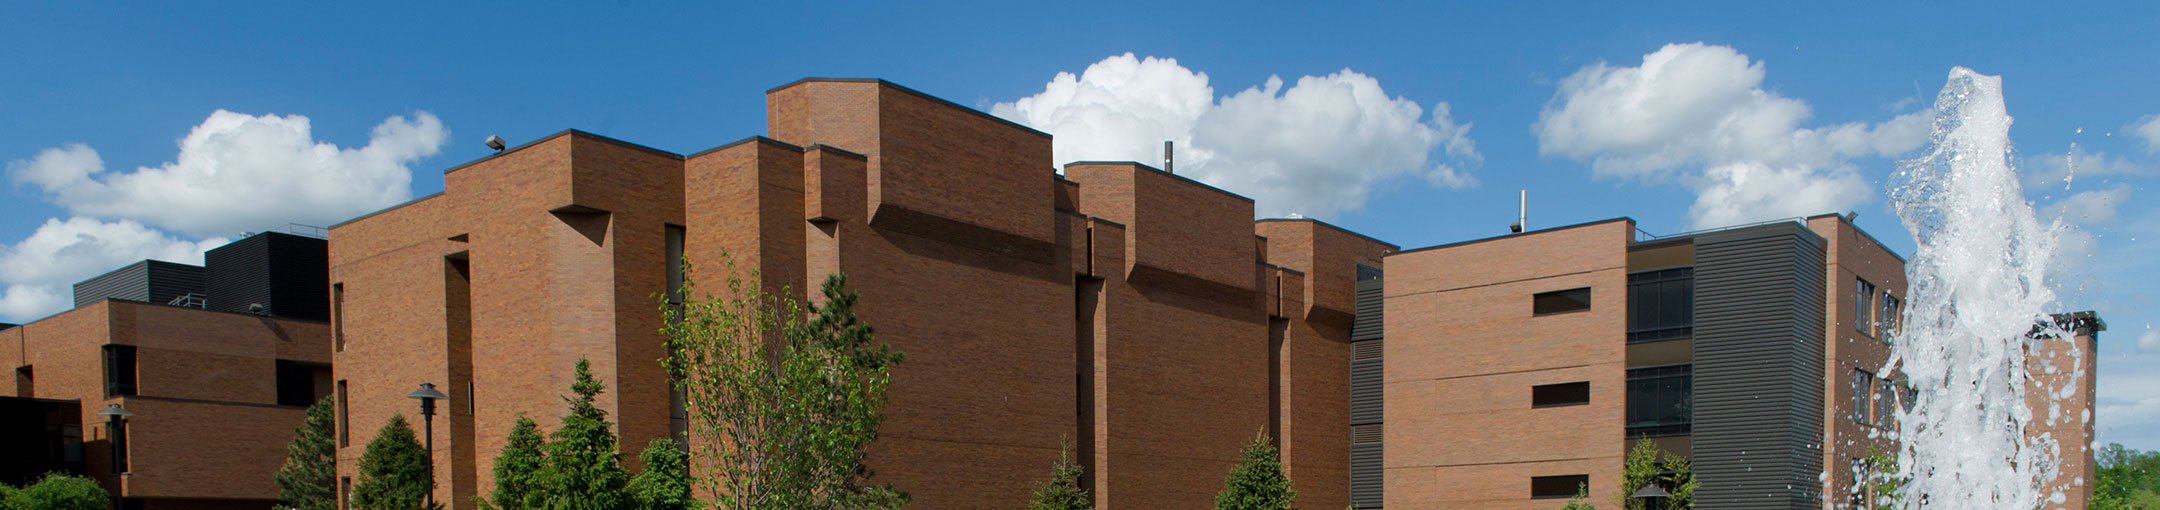 c8b489e9a0f063 College of Science